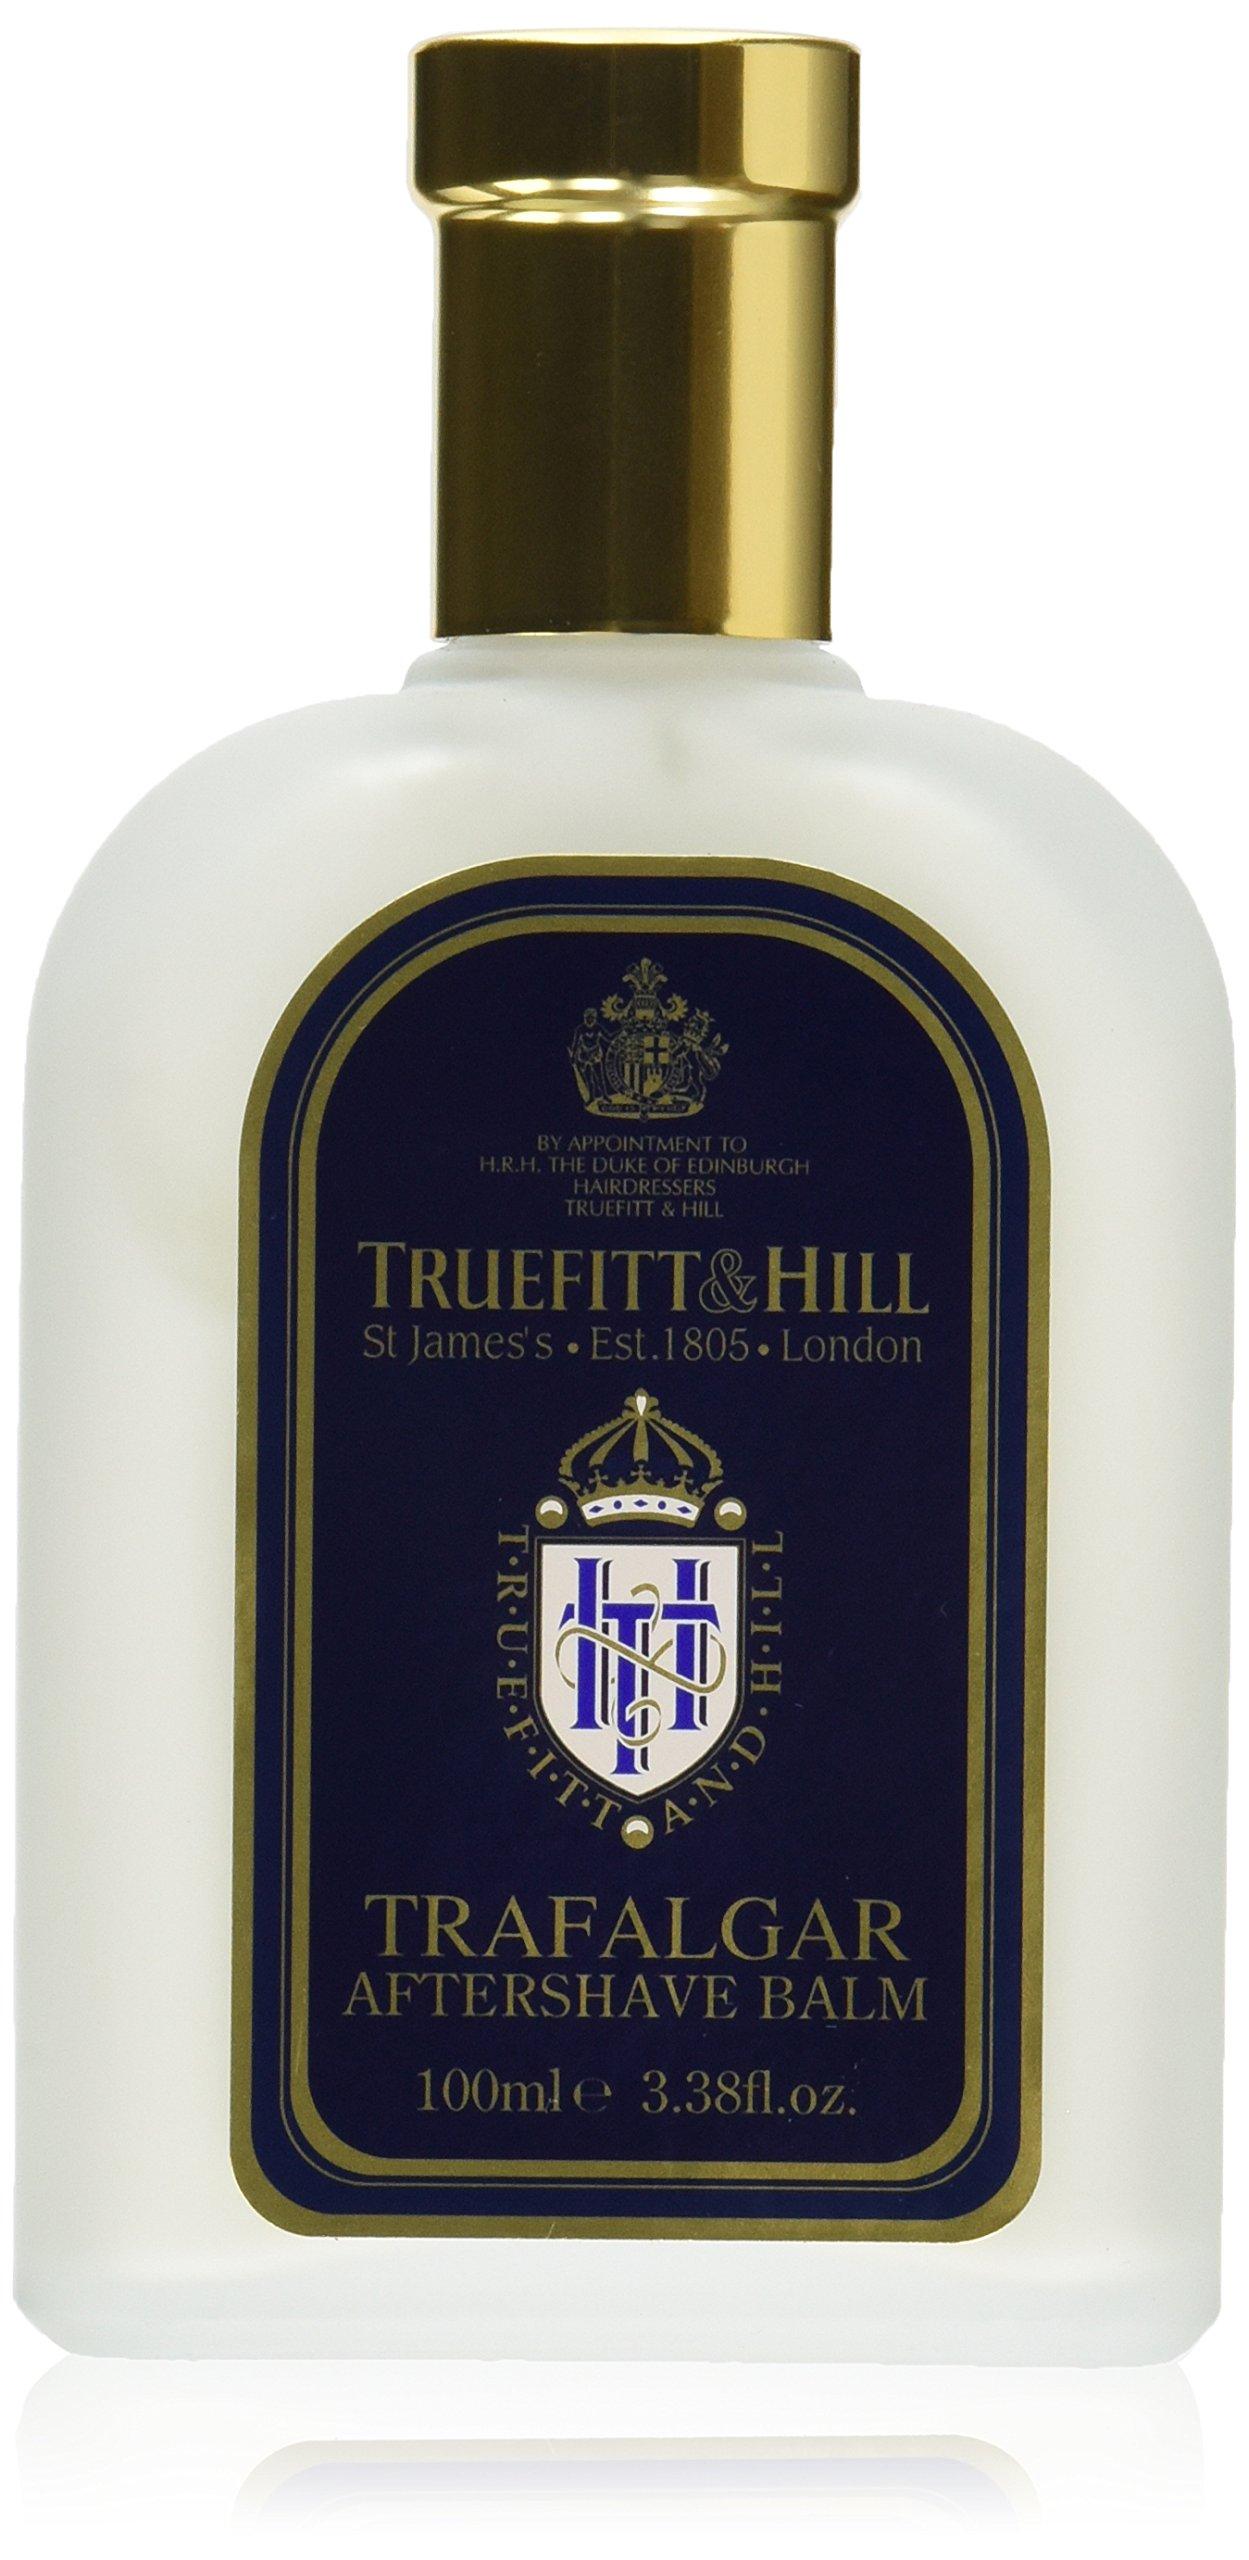 Truefitt & Hill Trafalgar After Shave Balm 100ml/3.38oz